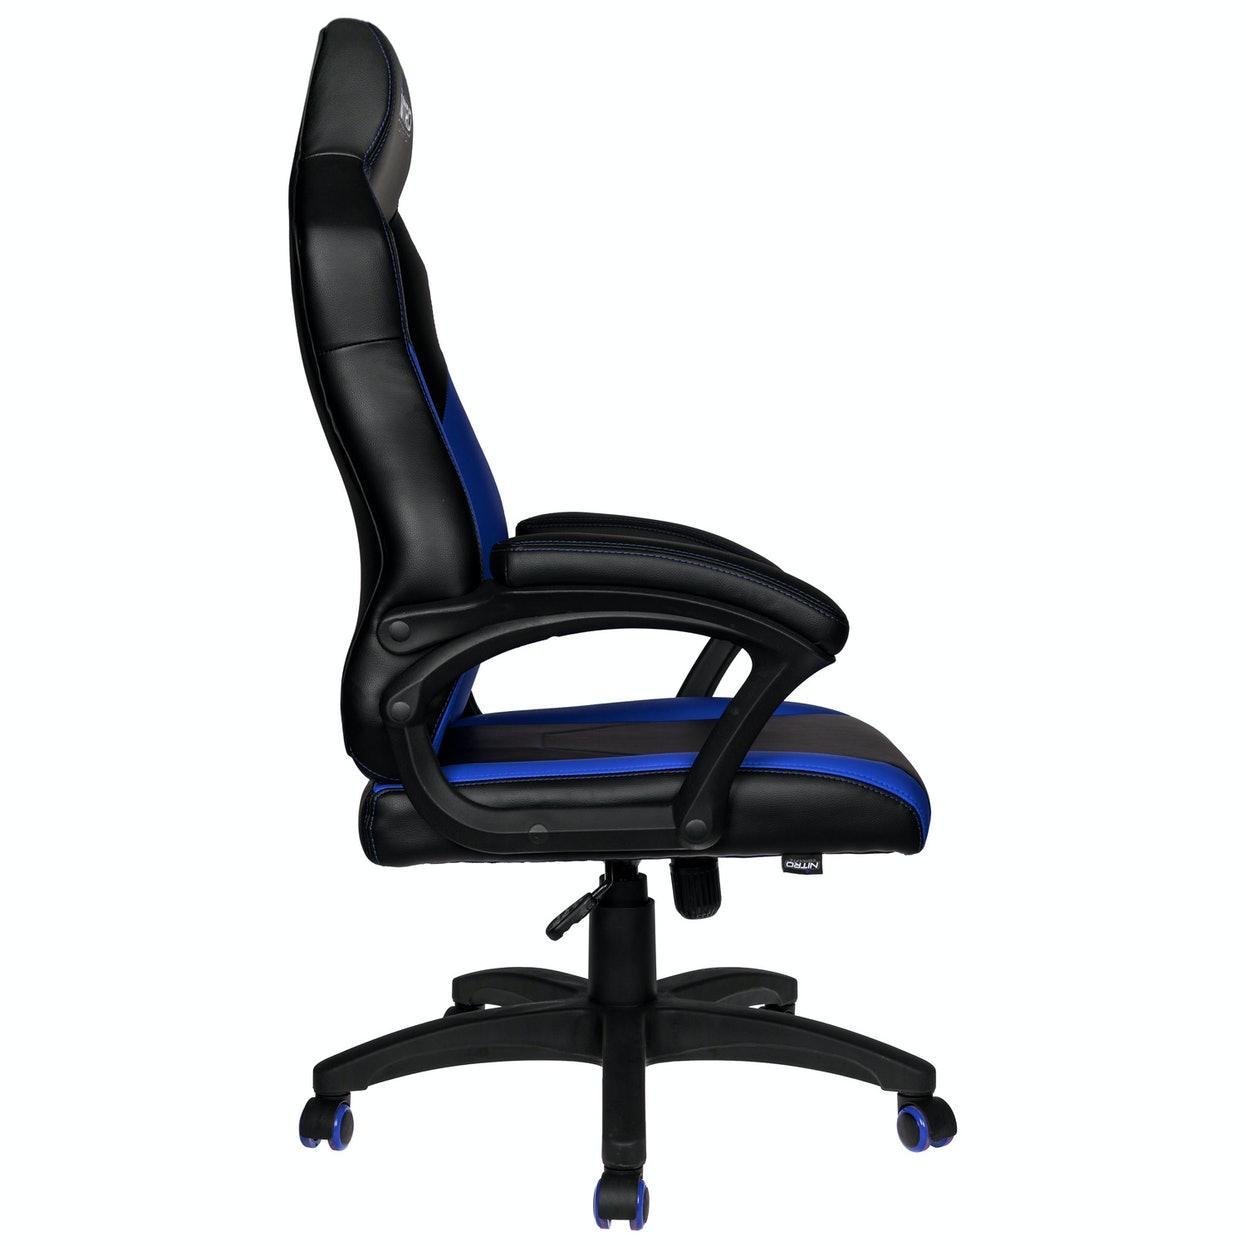 Геймърски стол Nitro Concepts C100 - Black/Blue-2